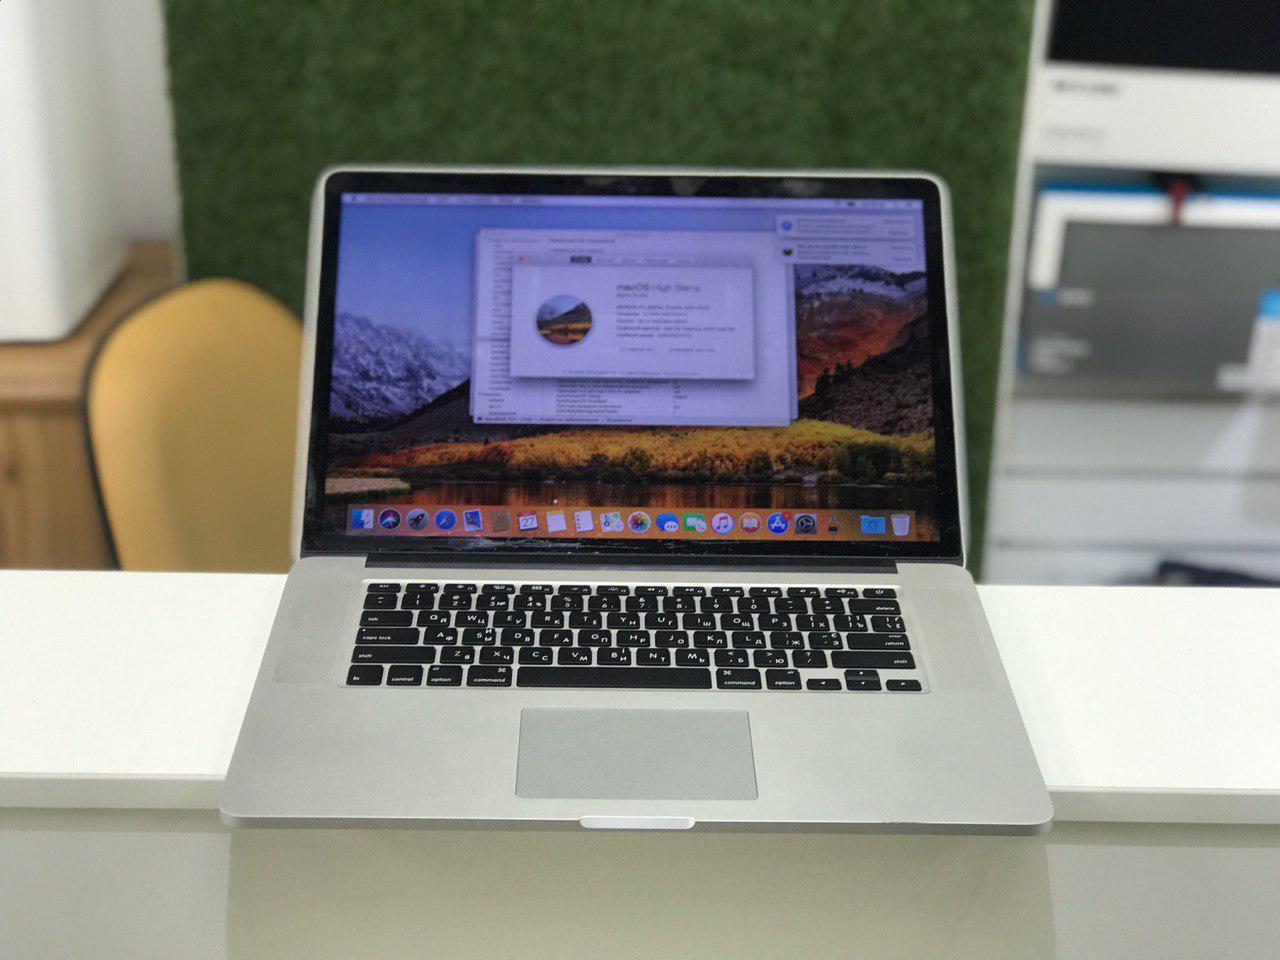 "Б/У Apple Macbook Pro 15 Early 2013 15,6"" i7 | 16 Ram | 500 SSD  Новая Батарея"